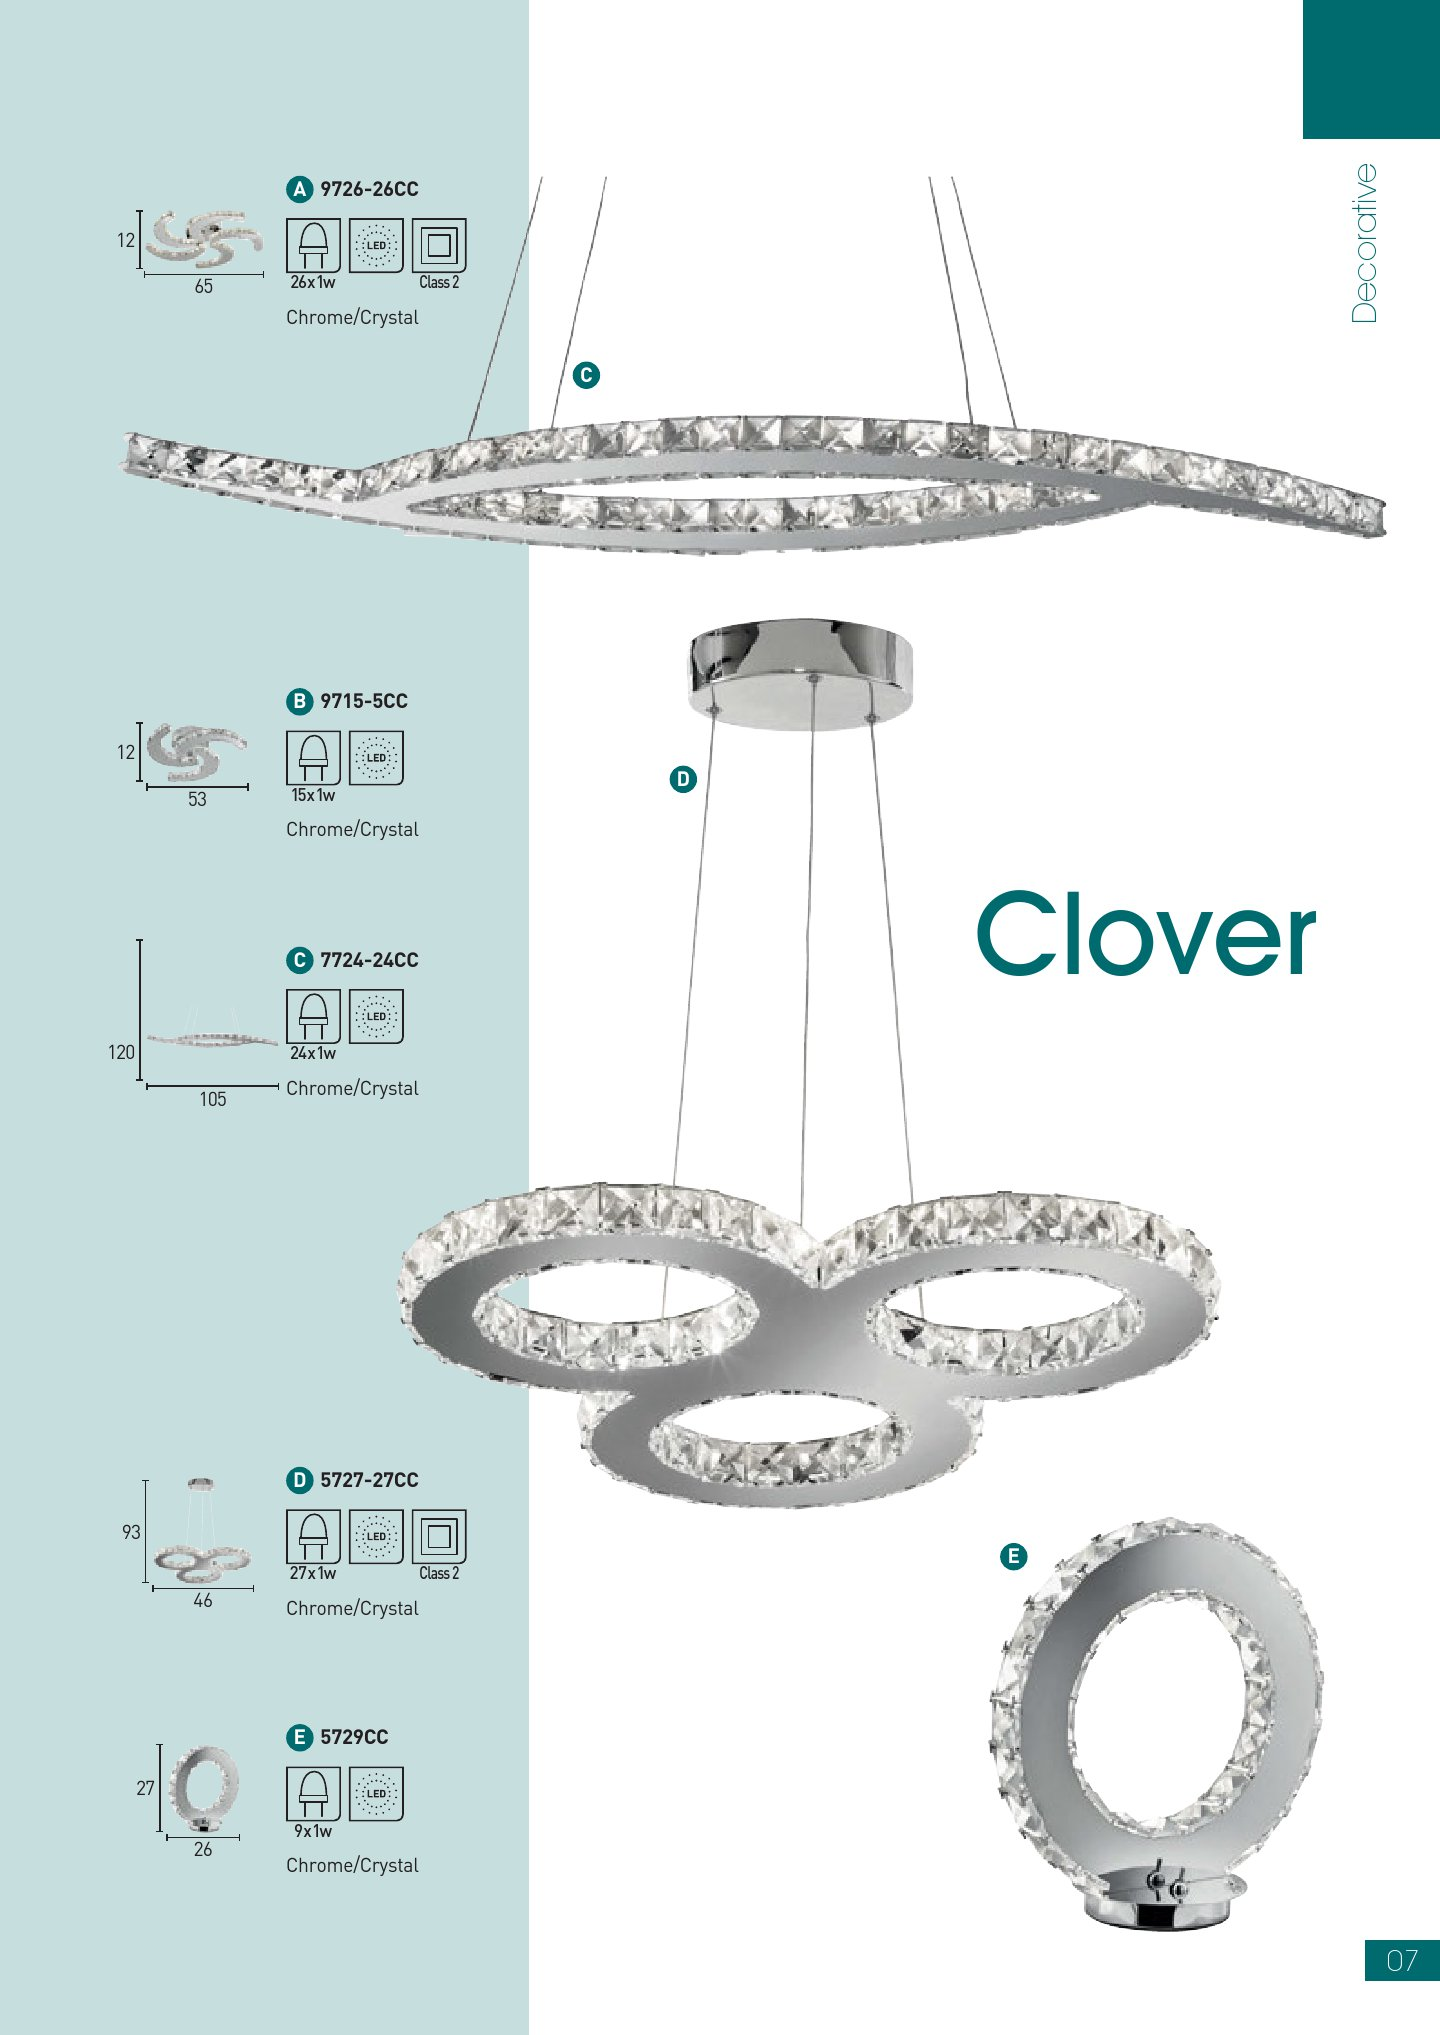 Clover 5727 27CC Cromo